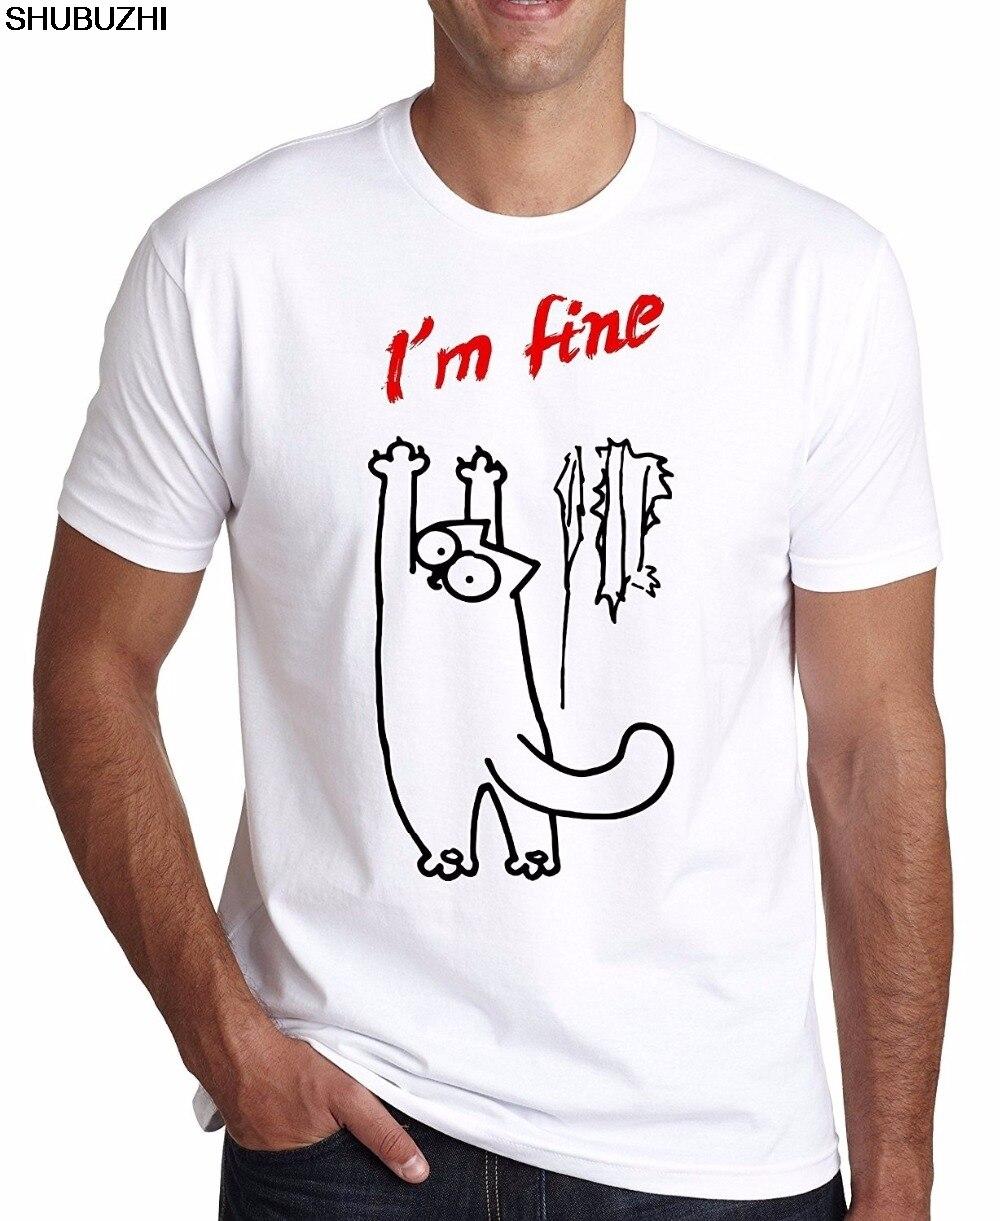 Gerade Custom T Shirts Online Premium Crew Neck Kurzarm Ich Bin Feine Simons Cat Herren Lustige T-shirt Herren T Shirts Sbz1280 Halsketten & Anhänger